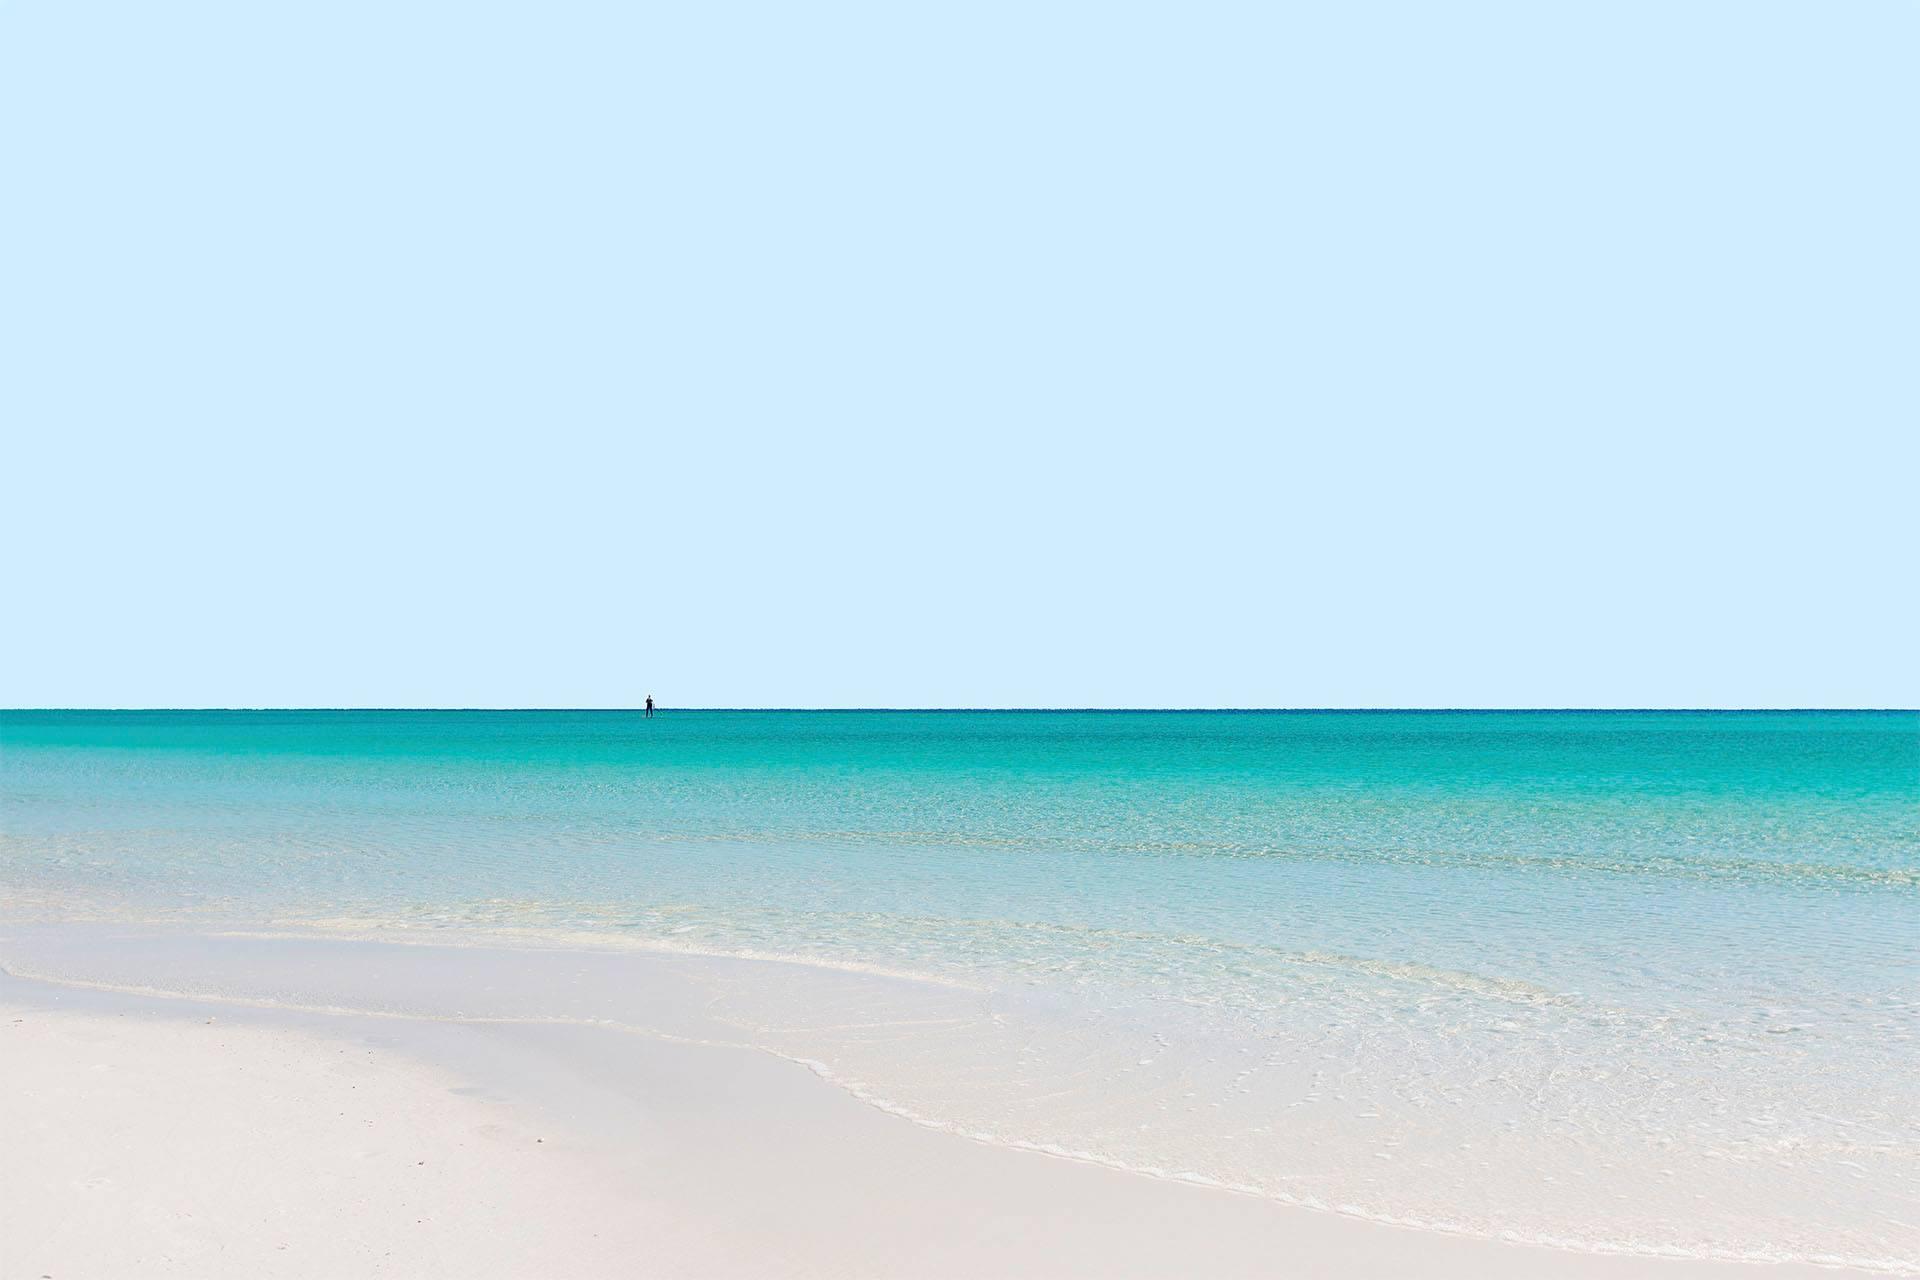 Ocean Reef Miramar Beach Florida.